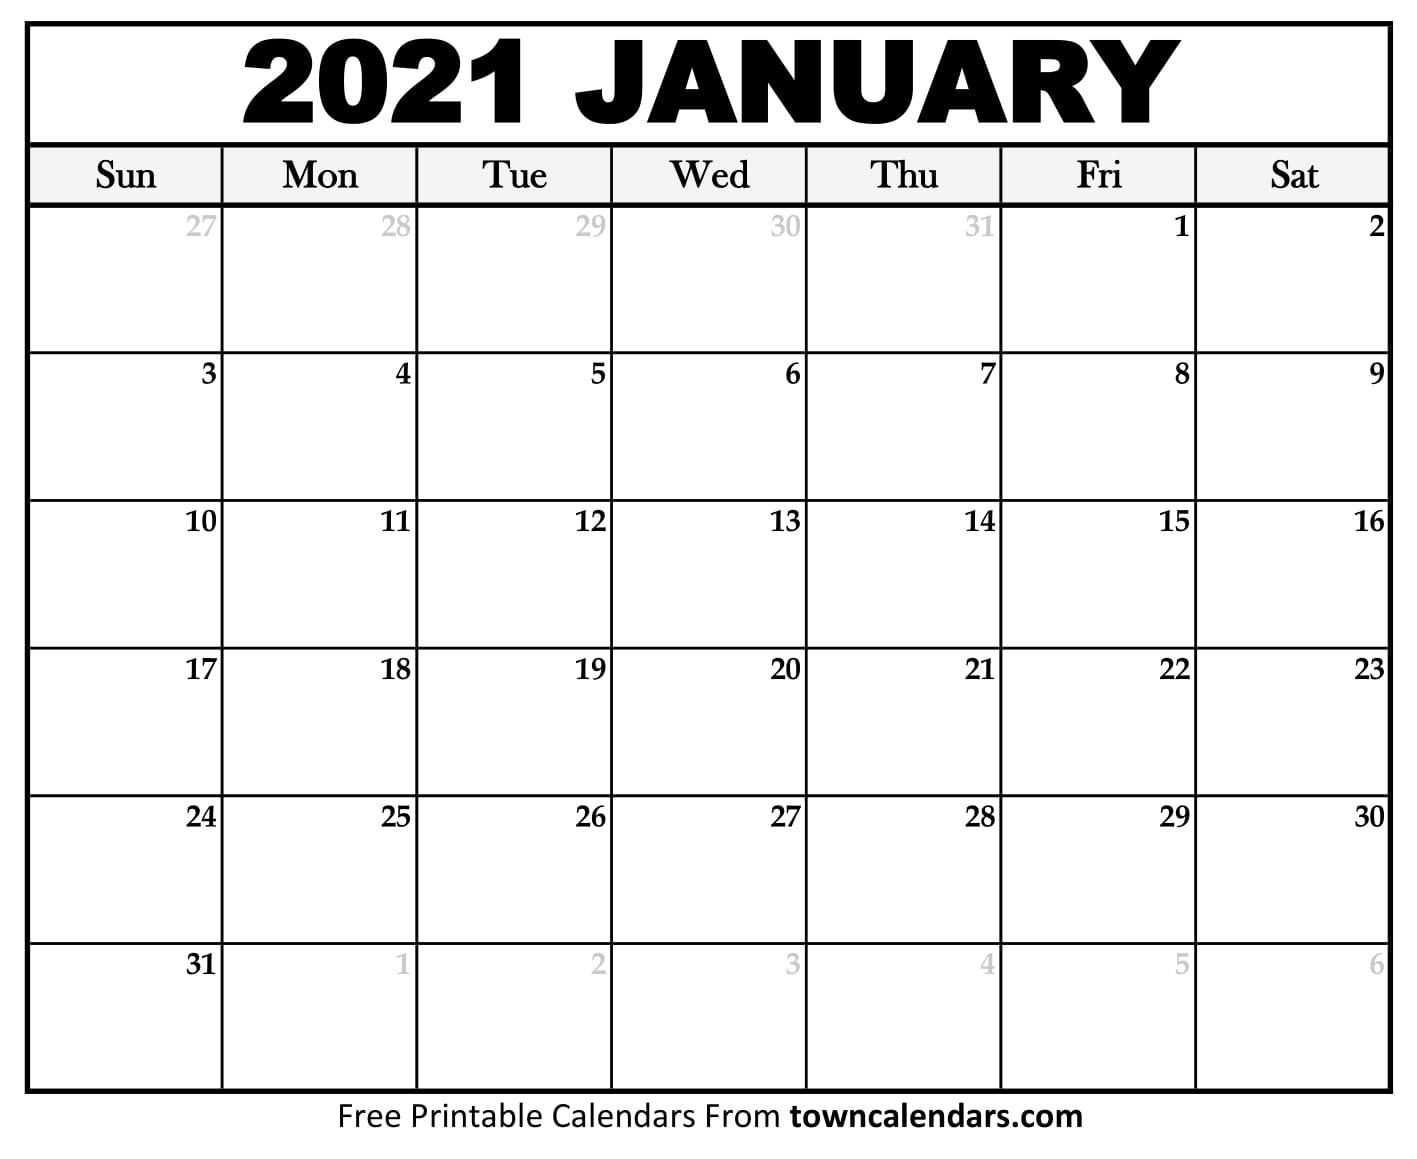 Printable January 2021 Calendar - Towncalendars intended for Waterproof Calendar 2021